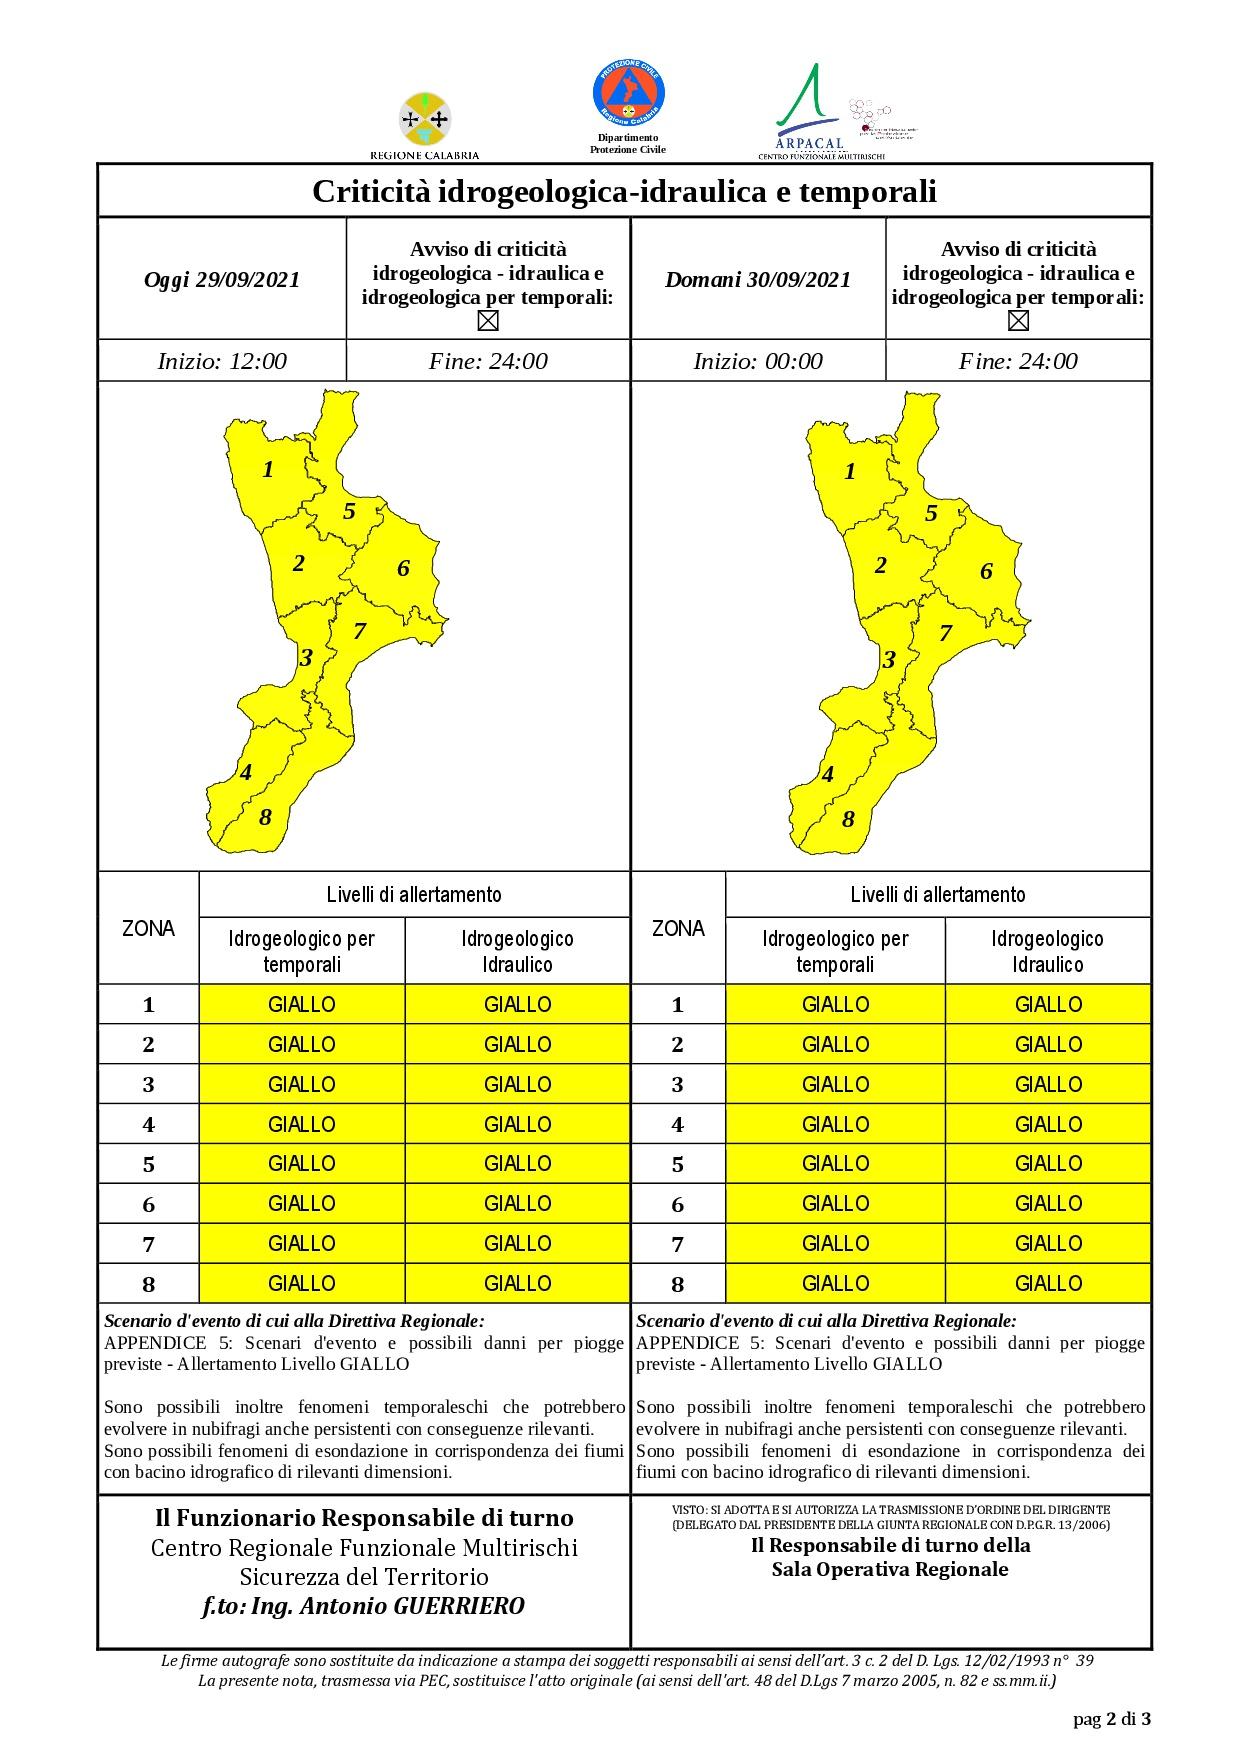 Criticità idrogeologica-idraulica e temporali in Calabria 29-09-2021